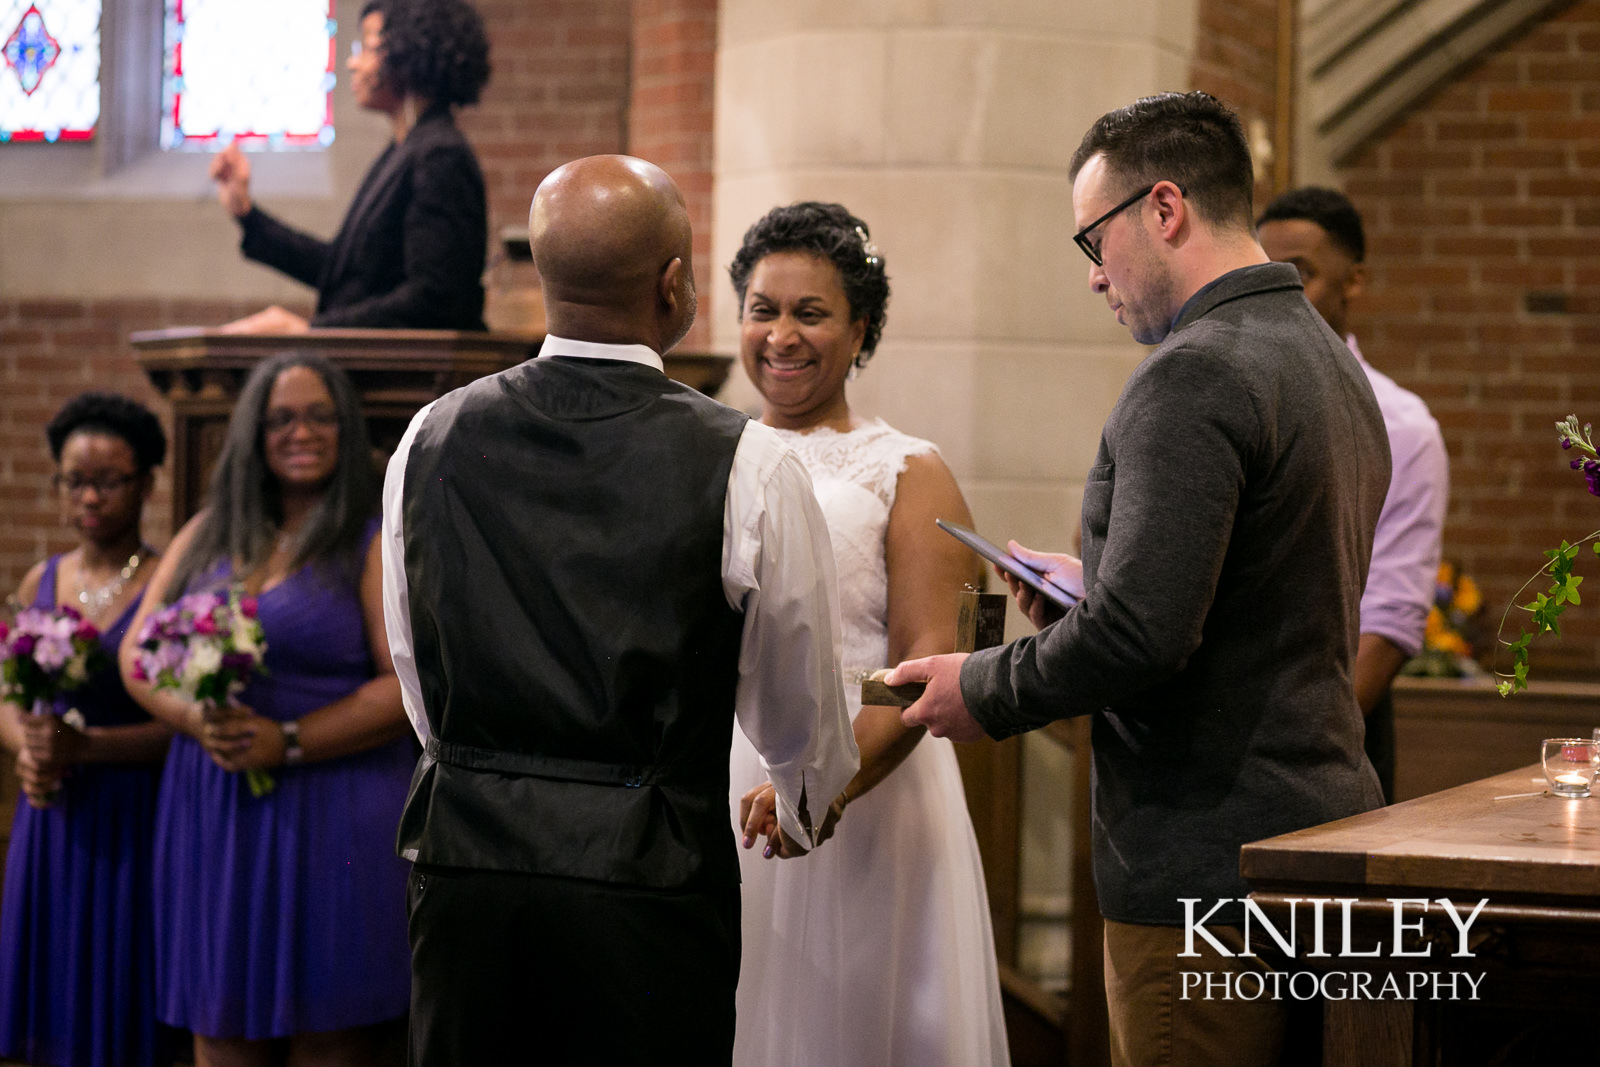 Rochester Colgate Divinity School Wedding - Classic Rochester NY Wedding - 025-IMG_5721.jpg